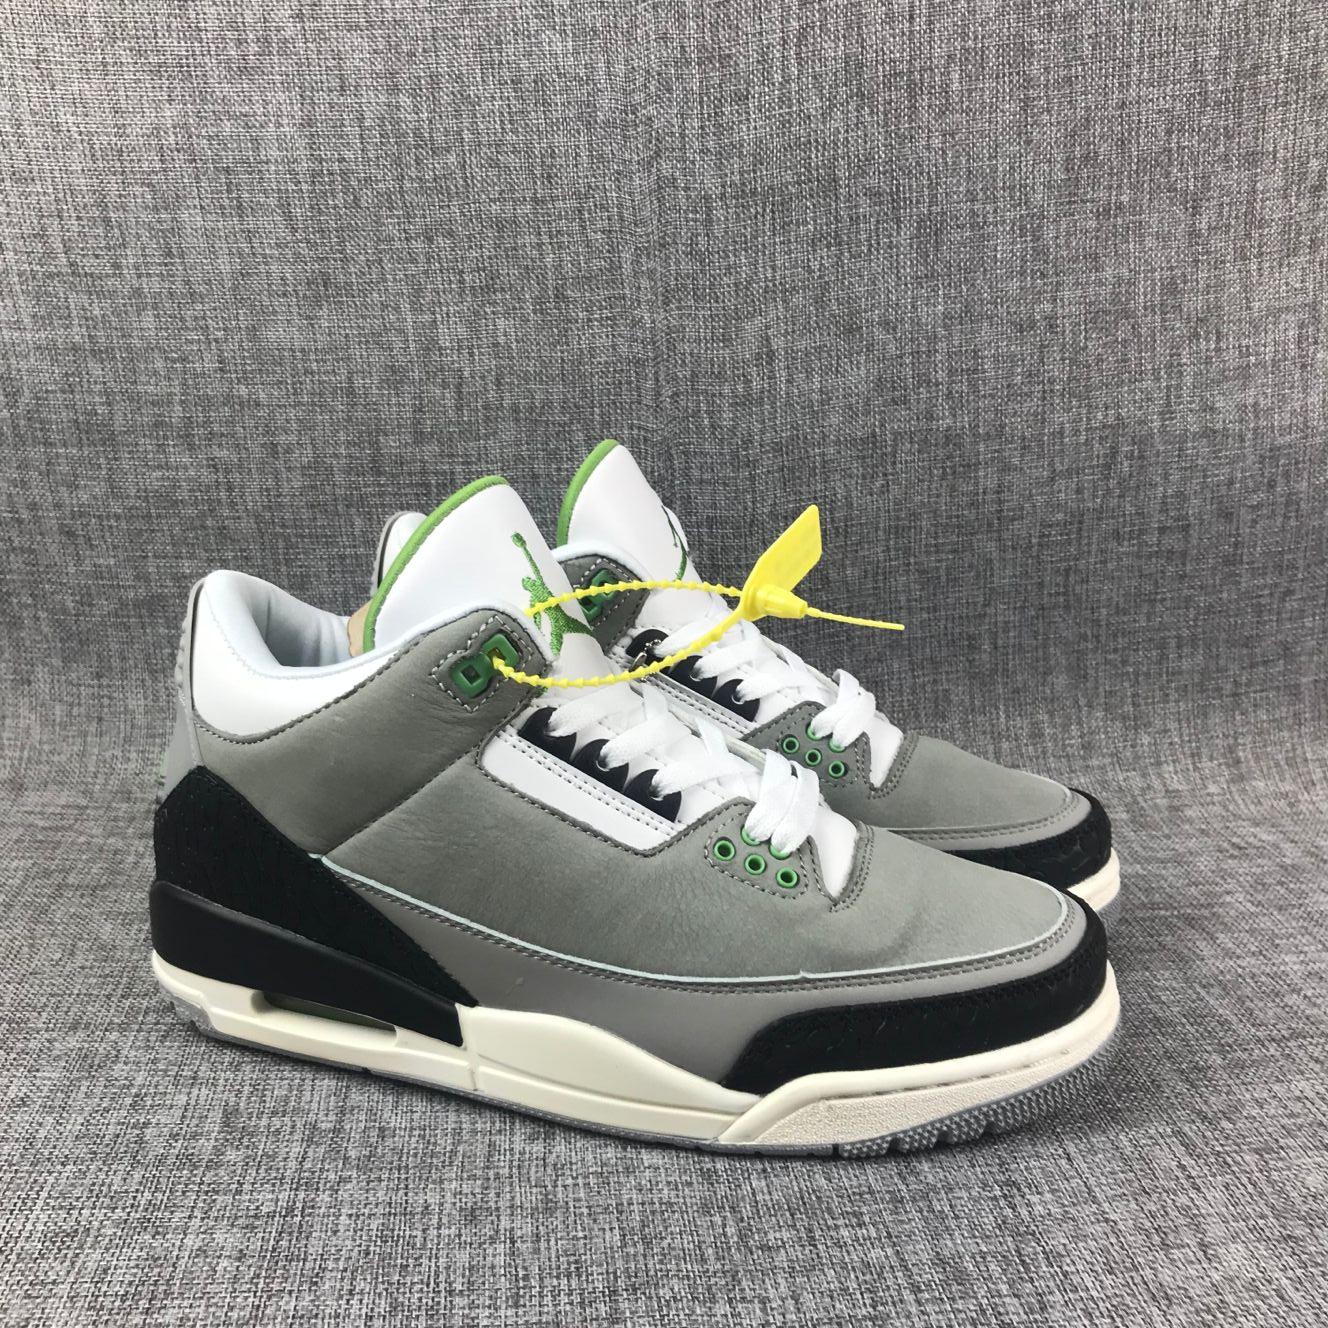 3be262c33d3 New Air Retro 3 Men Basketball Shoes · YogaCloth · Online Store ...